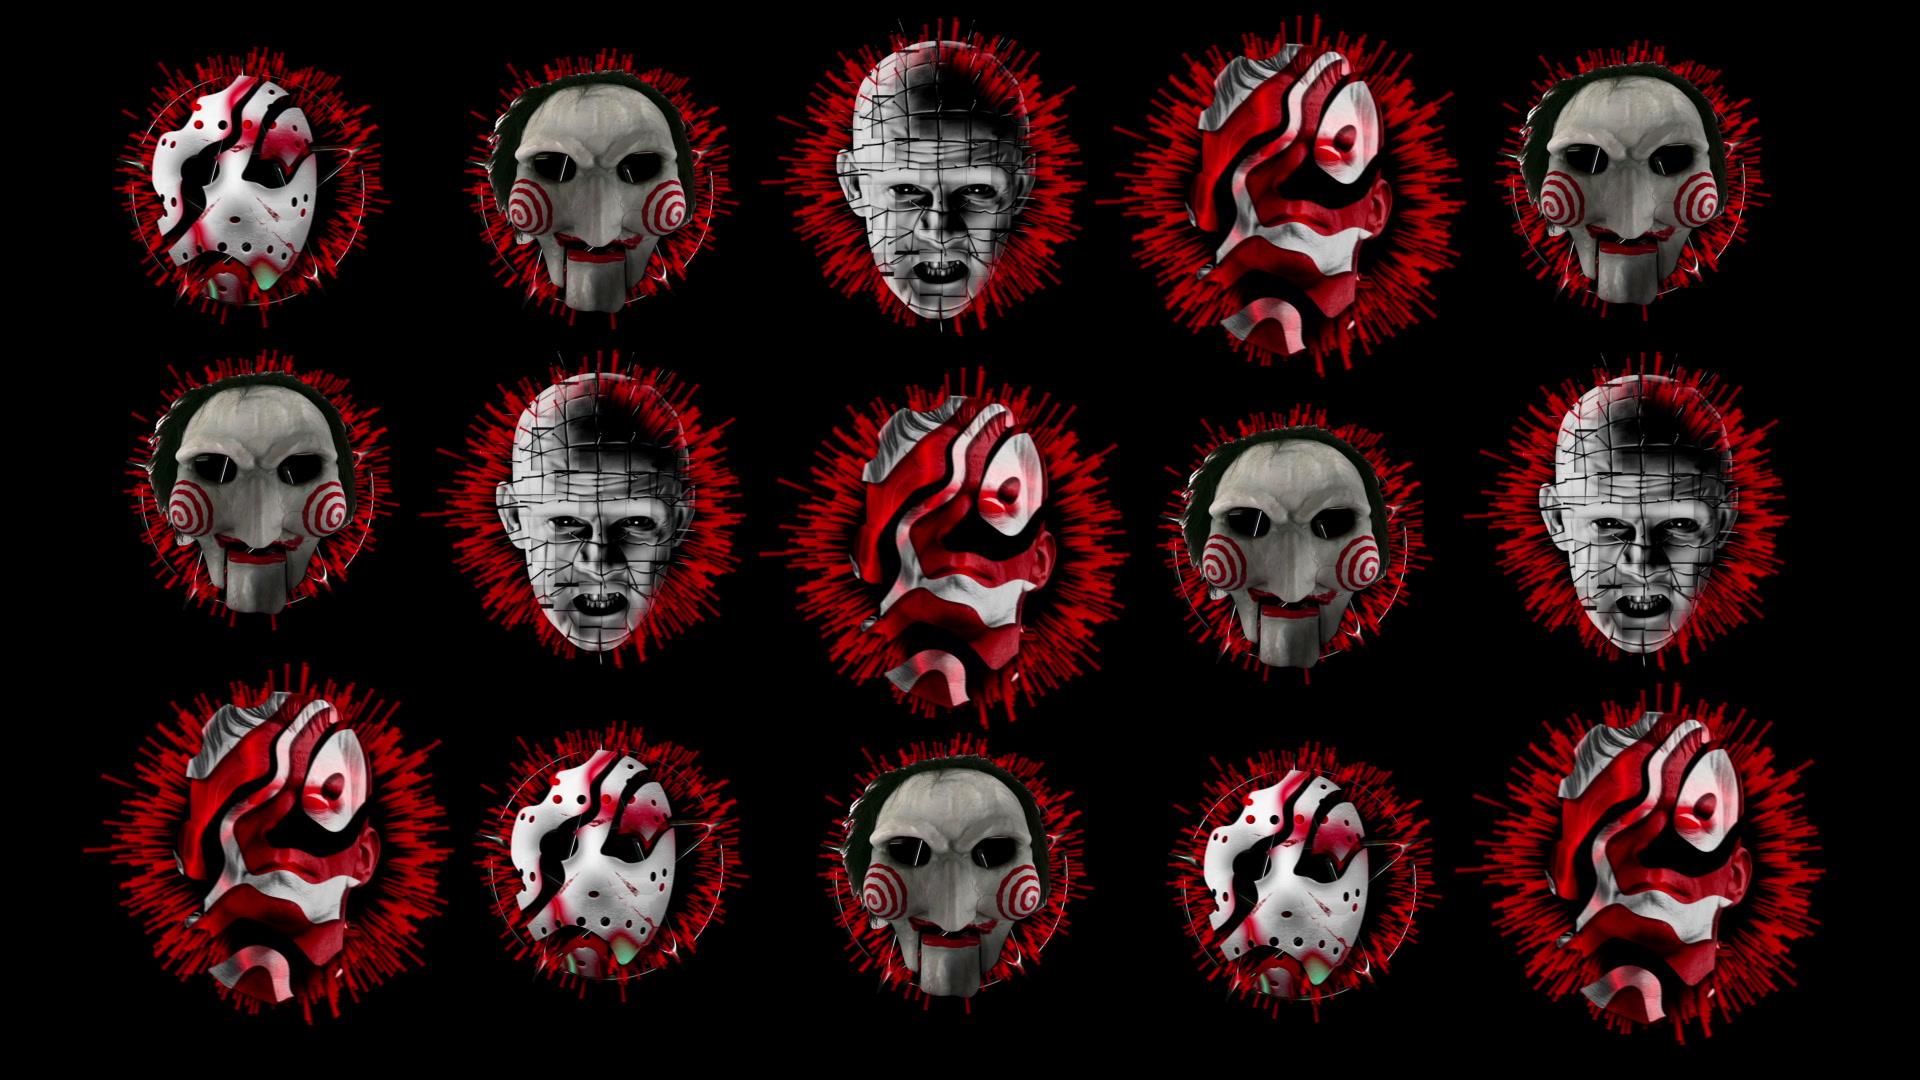 Hell Texture Z1 Vj Loop Full Hd Halloween Horror Visuals